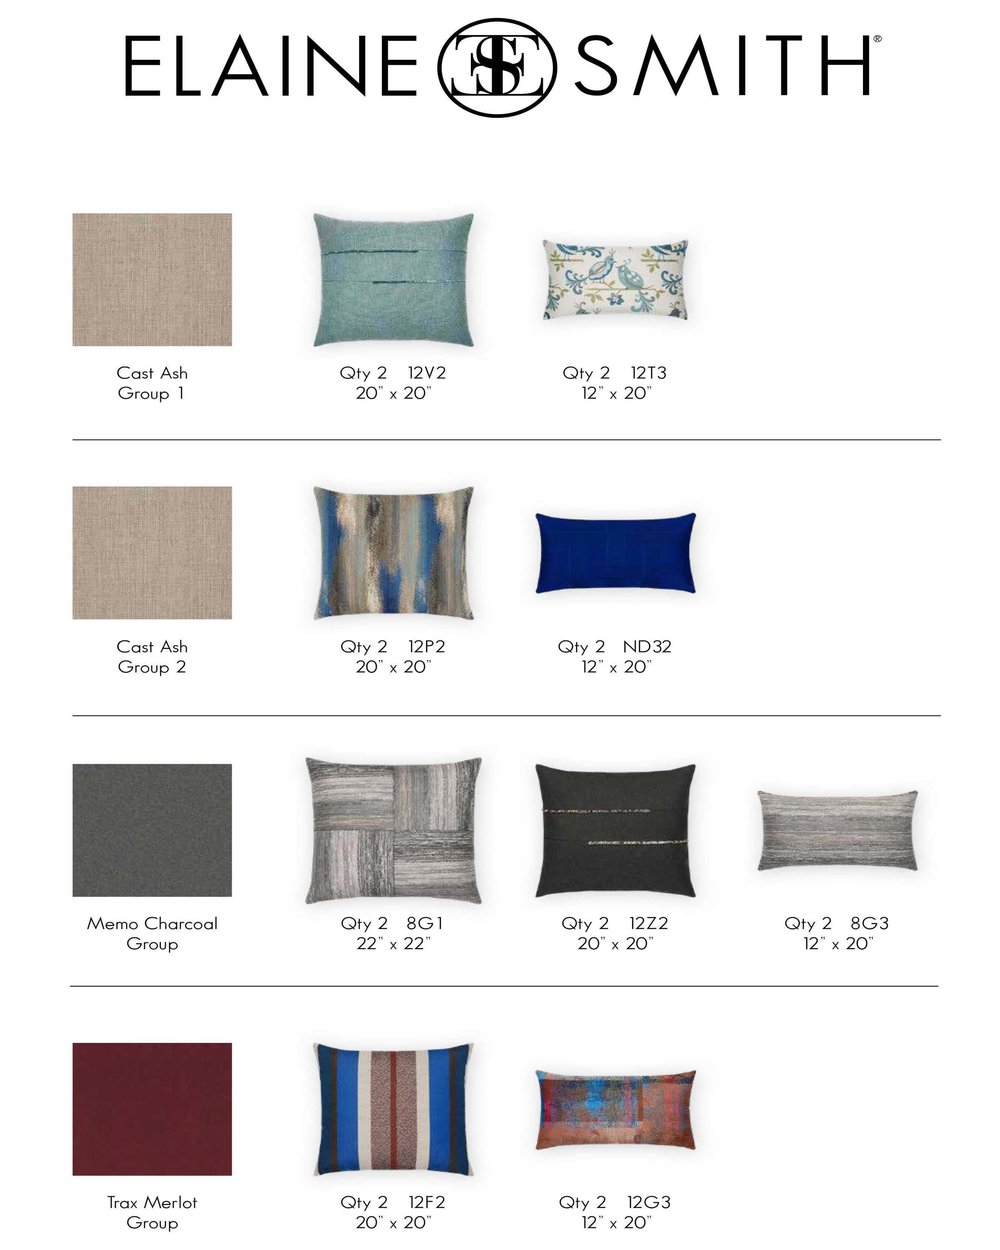 Elaine Smith Stock Pillows and Shelves-1.jpg